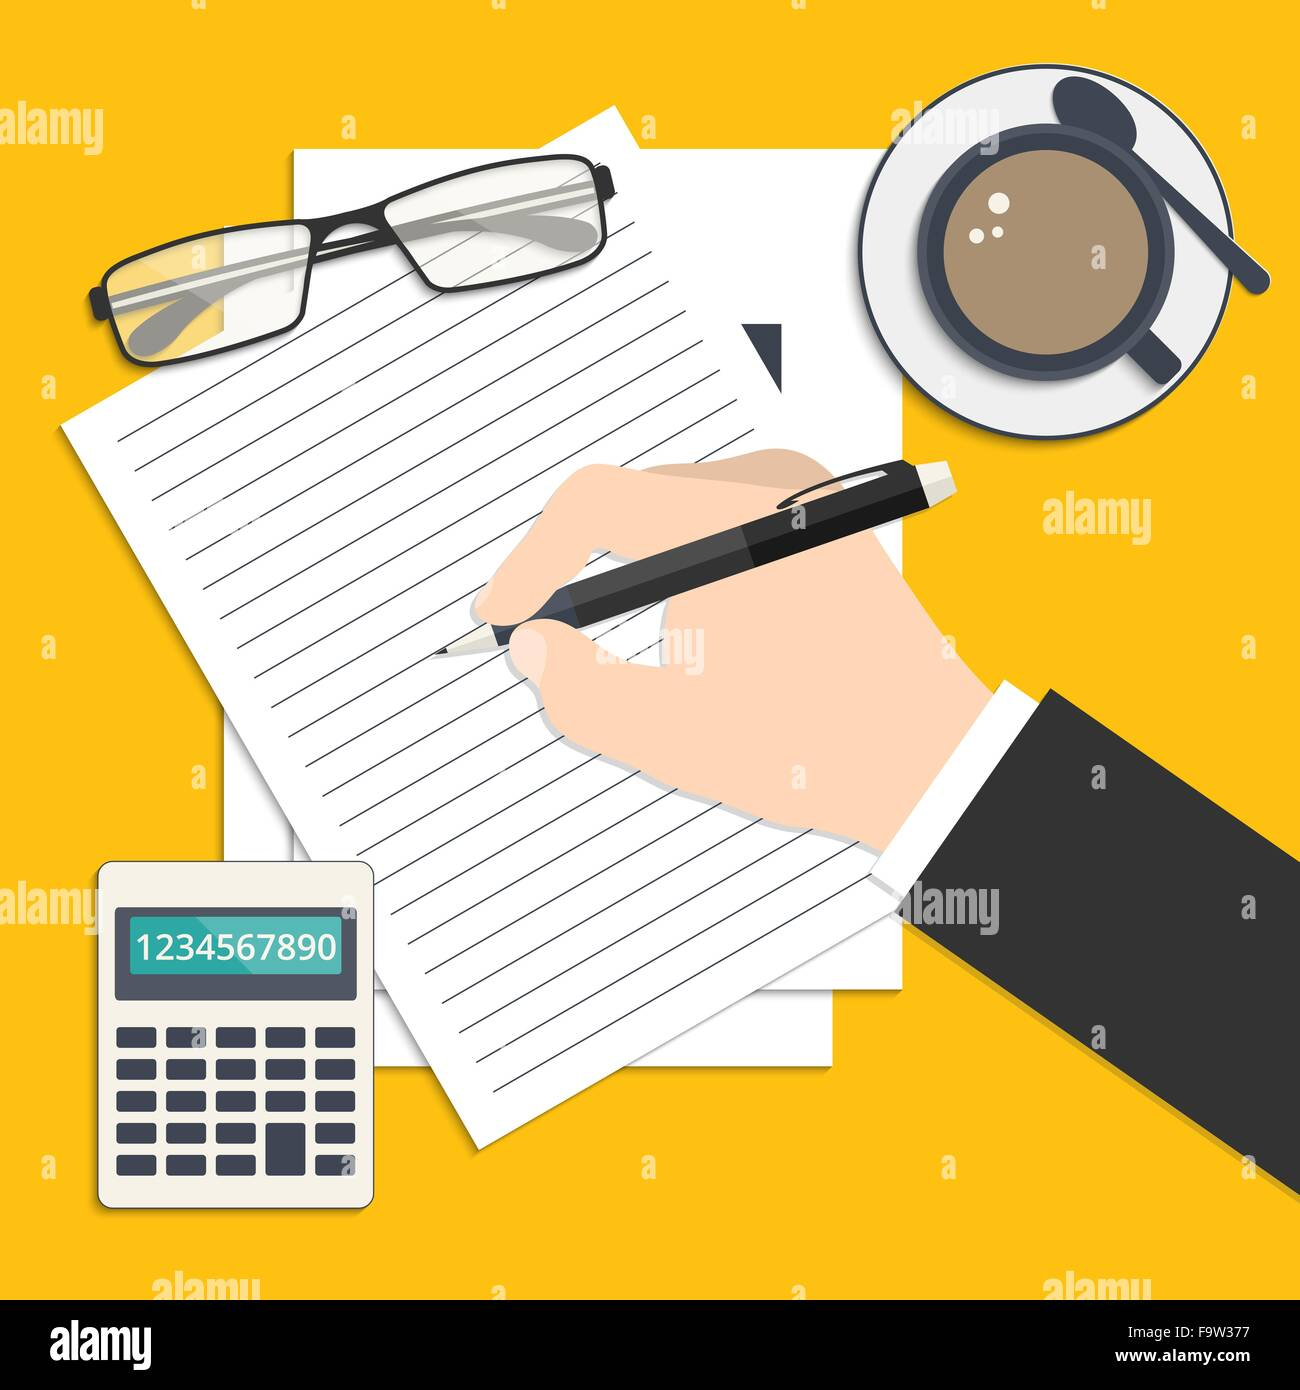 Resume Vector Icons Set Imágenes De Stock & Resume Vector Icons Set ...